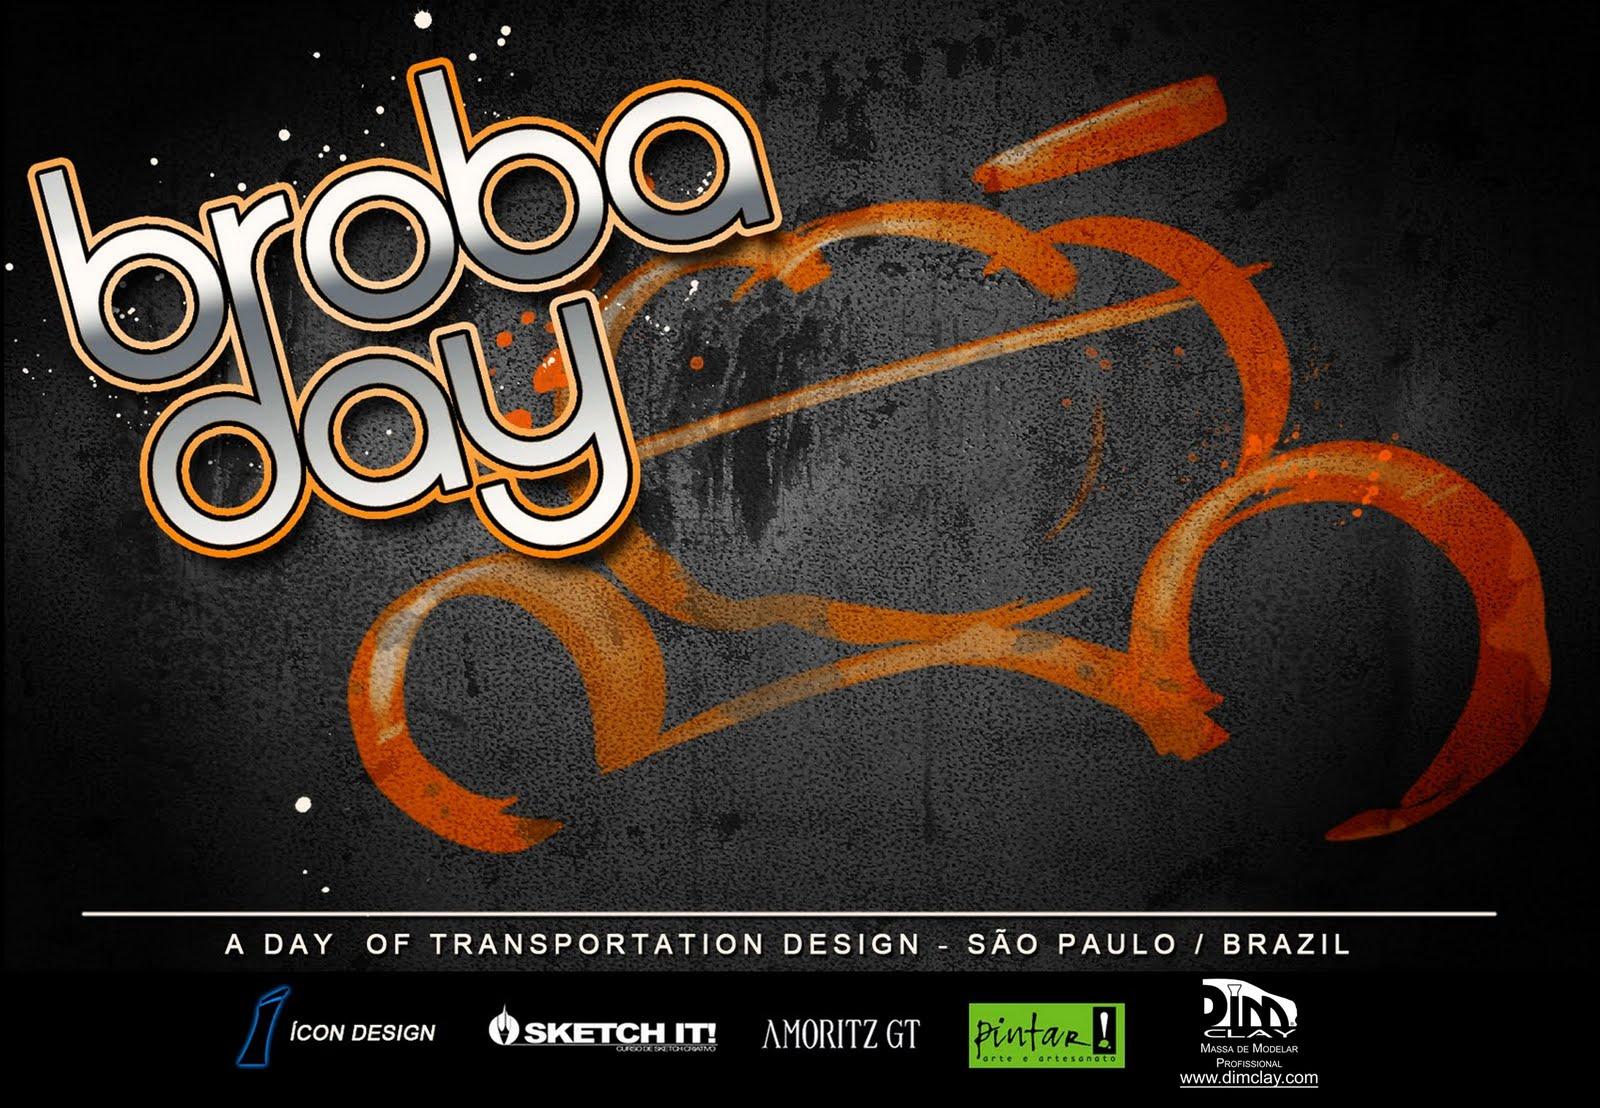 Broda Day 24/07/2010 Brobaday+logo